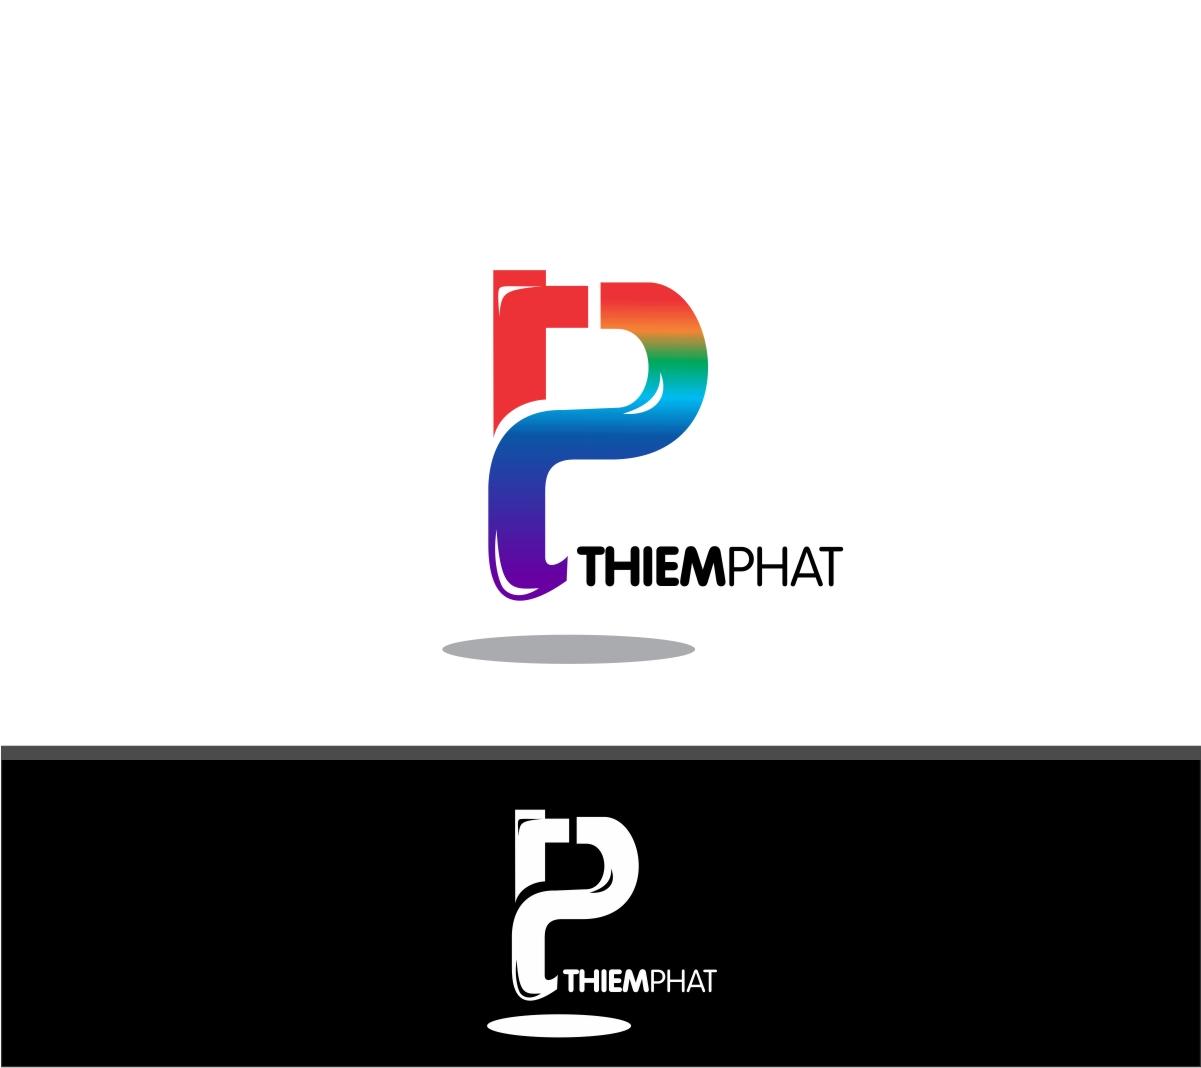 Logo Design by IDESIGNSTUDIO - Entry No. 124 in the Logo Design Contest New Logo Design for Thiem Phat company.